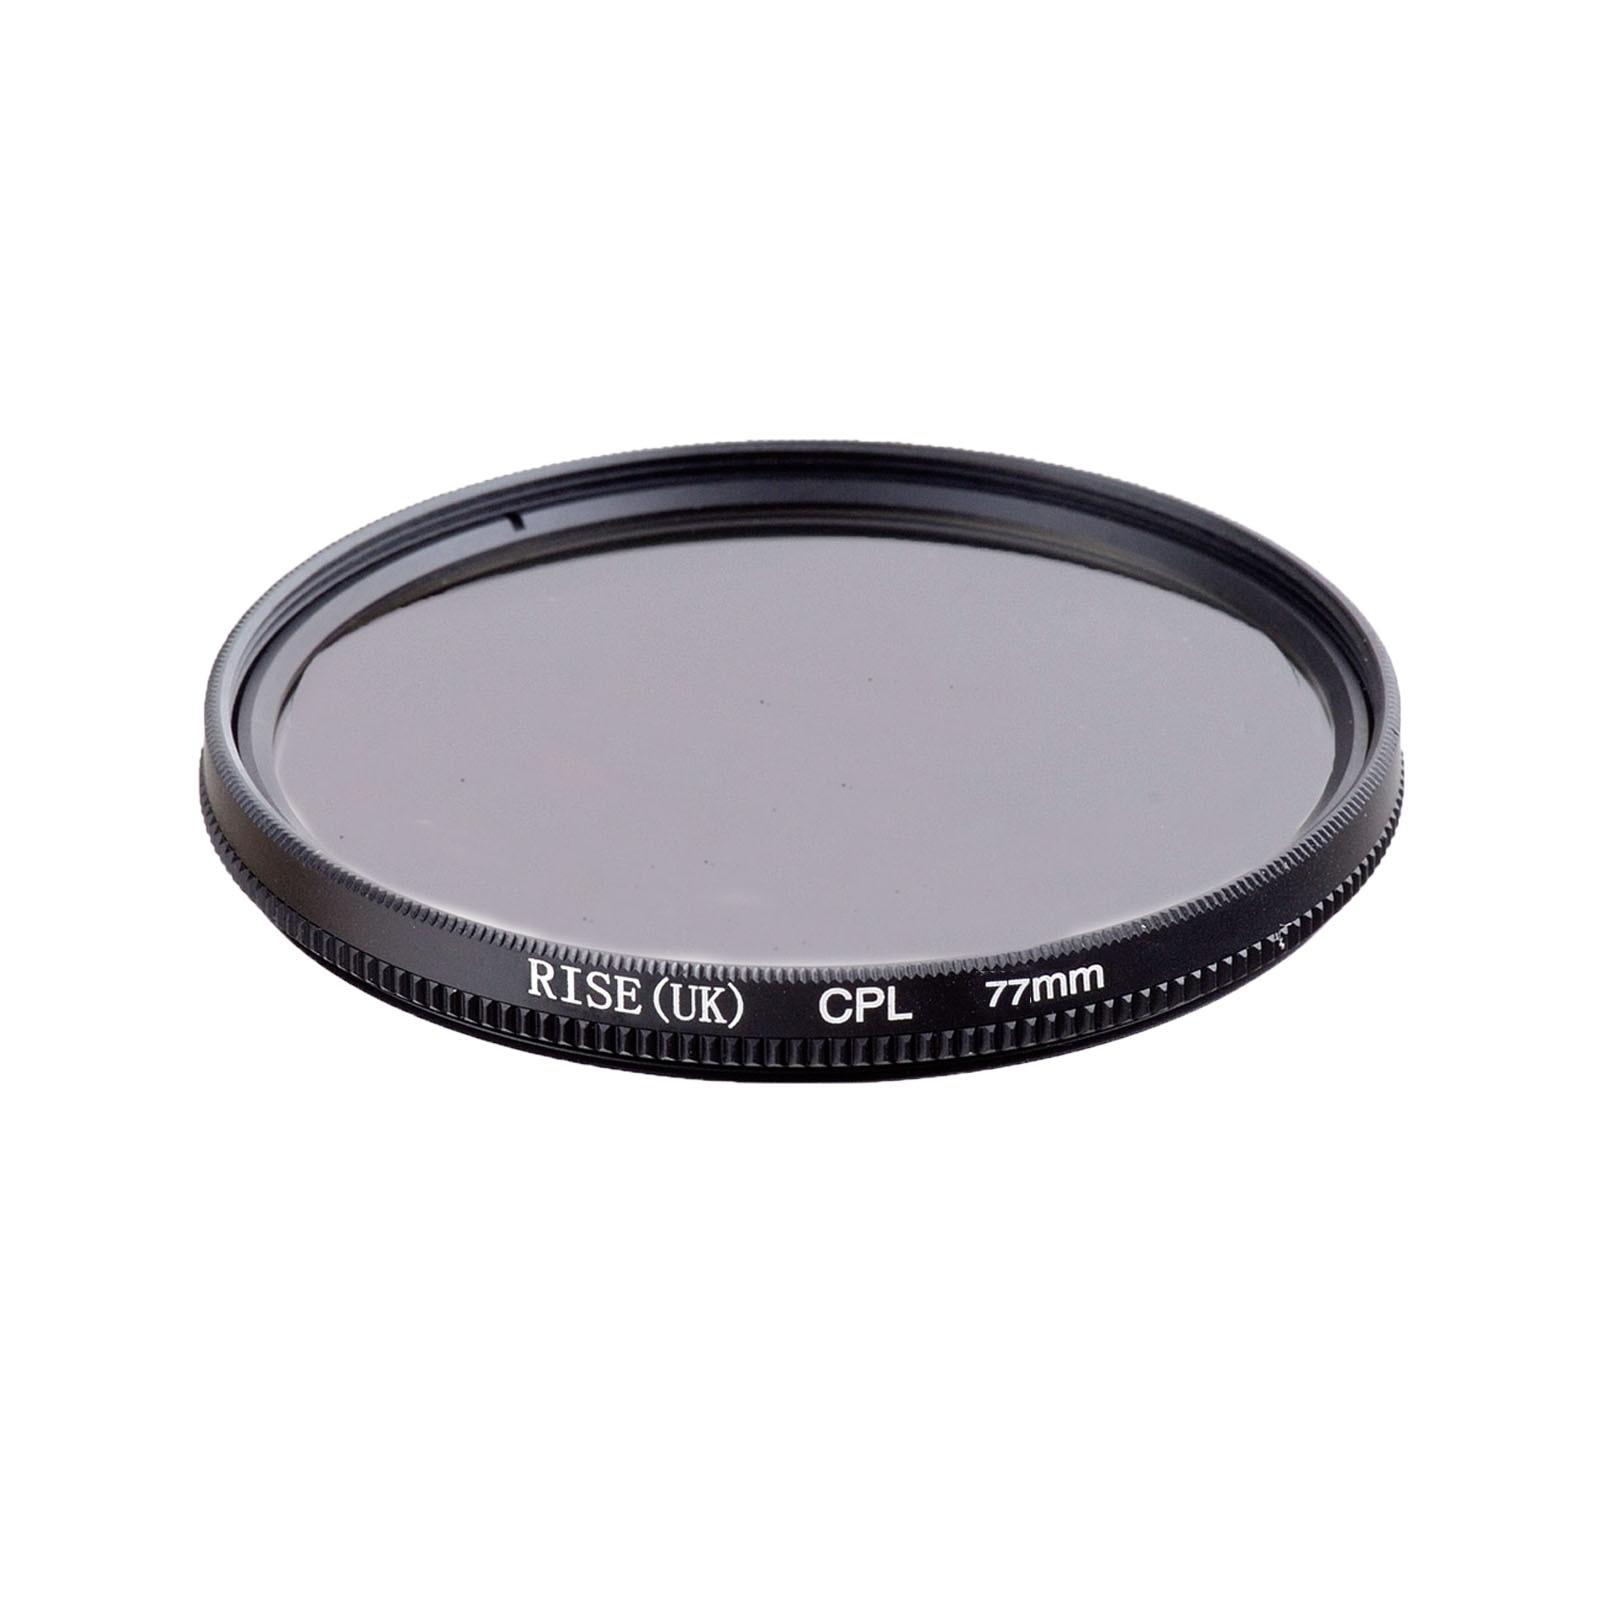 RISE 77mm Circular Polarizing CPL C PL Filter Lens 77mm For Canon NIKON Sony Olympus Camera